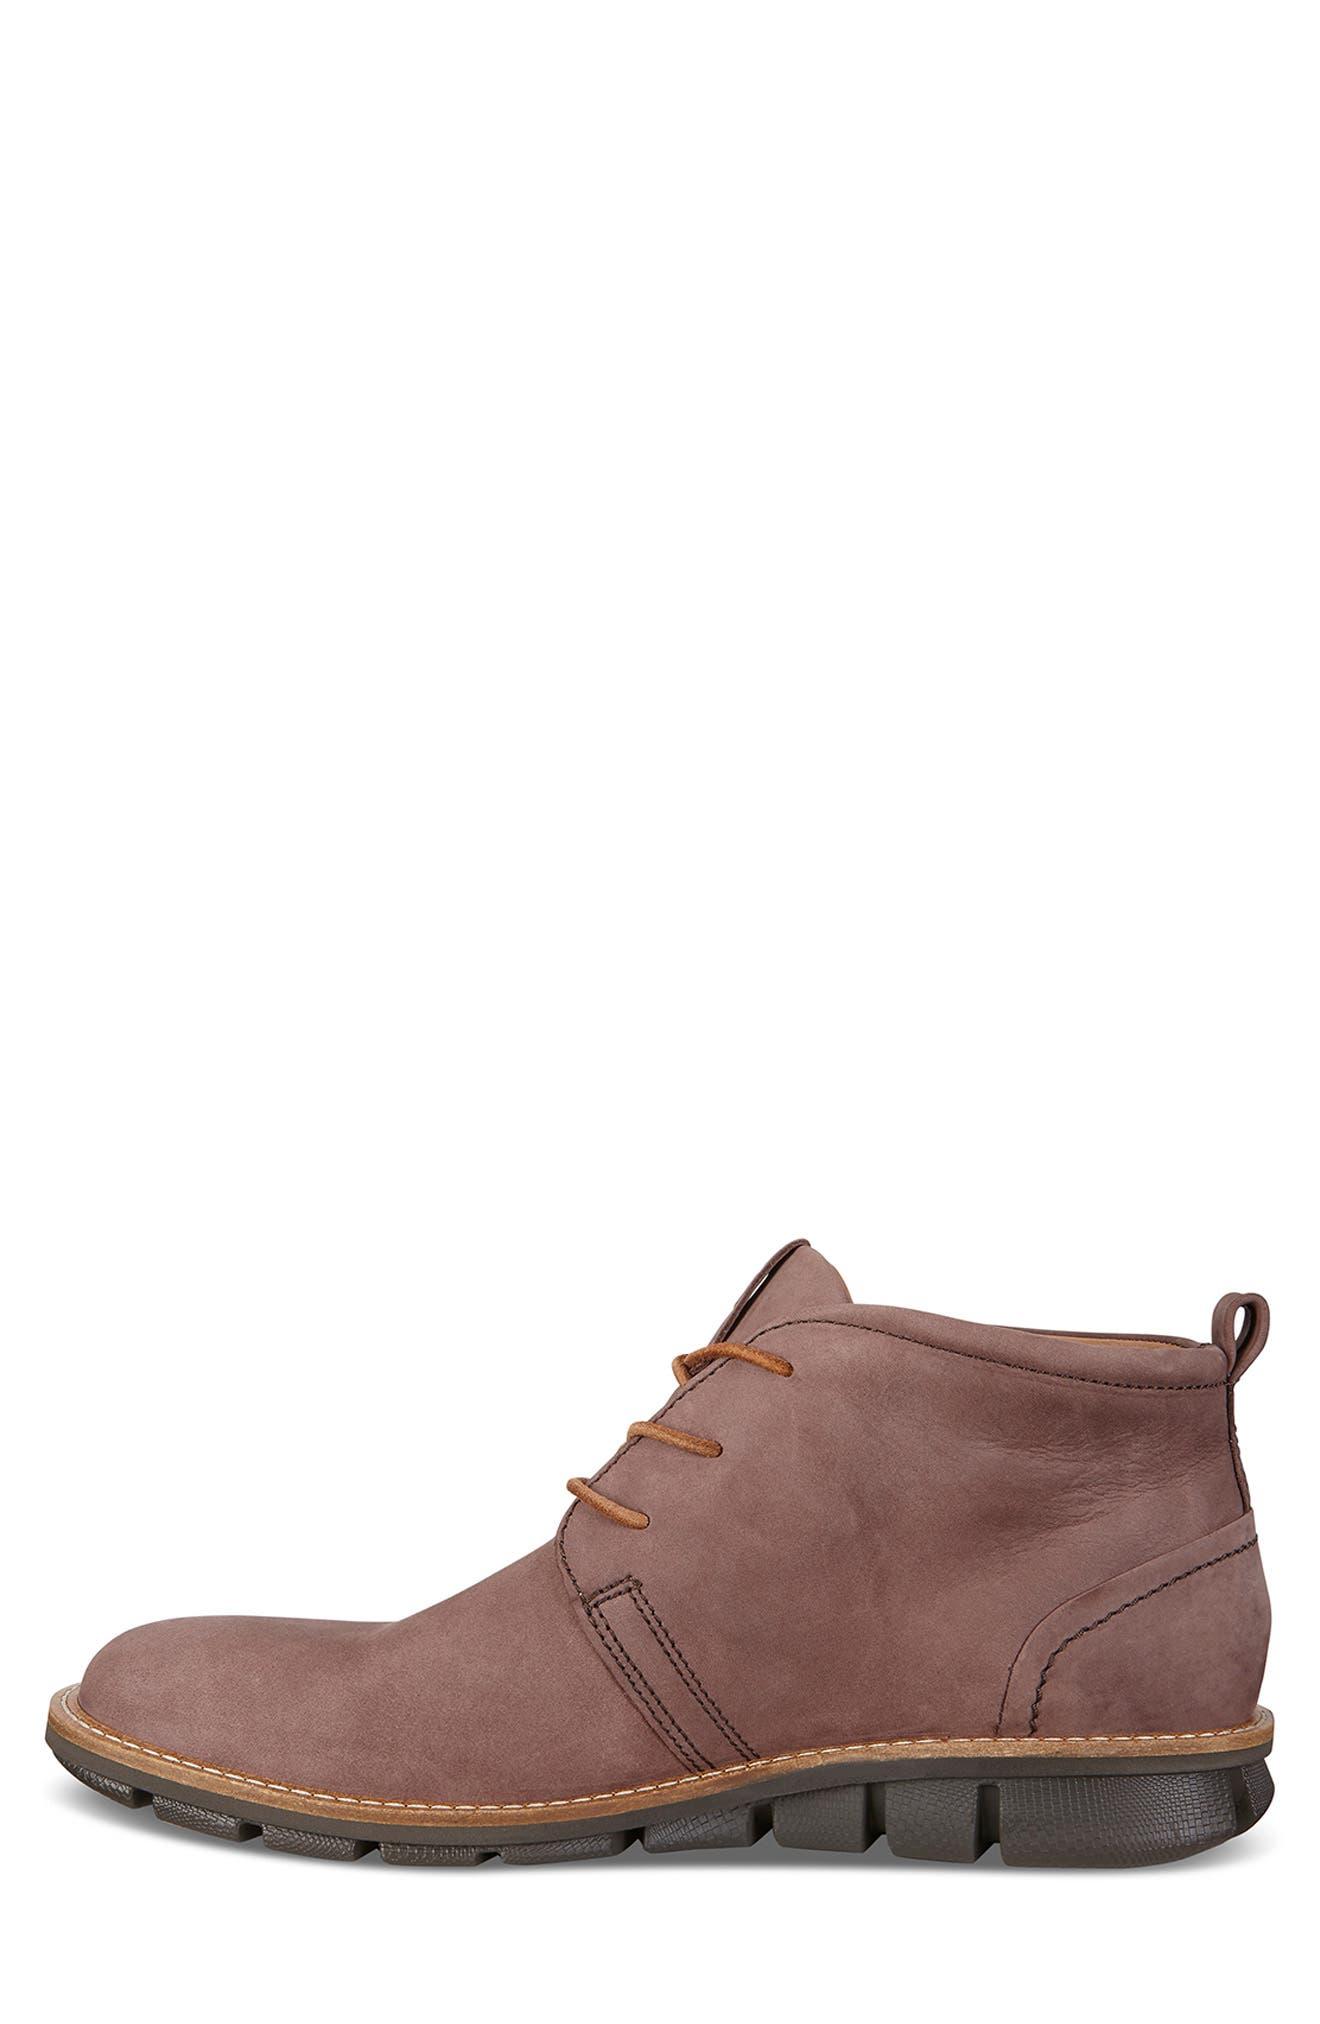 'Jeremy Hybrid' Plain Toe Boot,                             Alternate thumbnail 8, color,                             COFFEE LEATHER